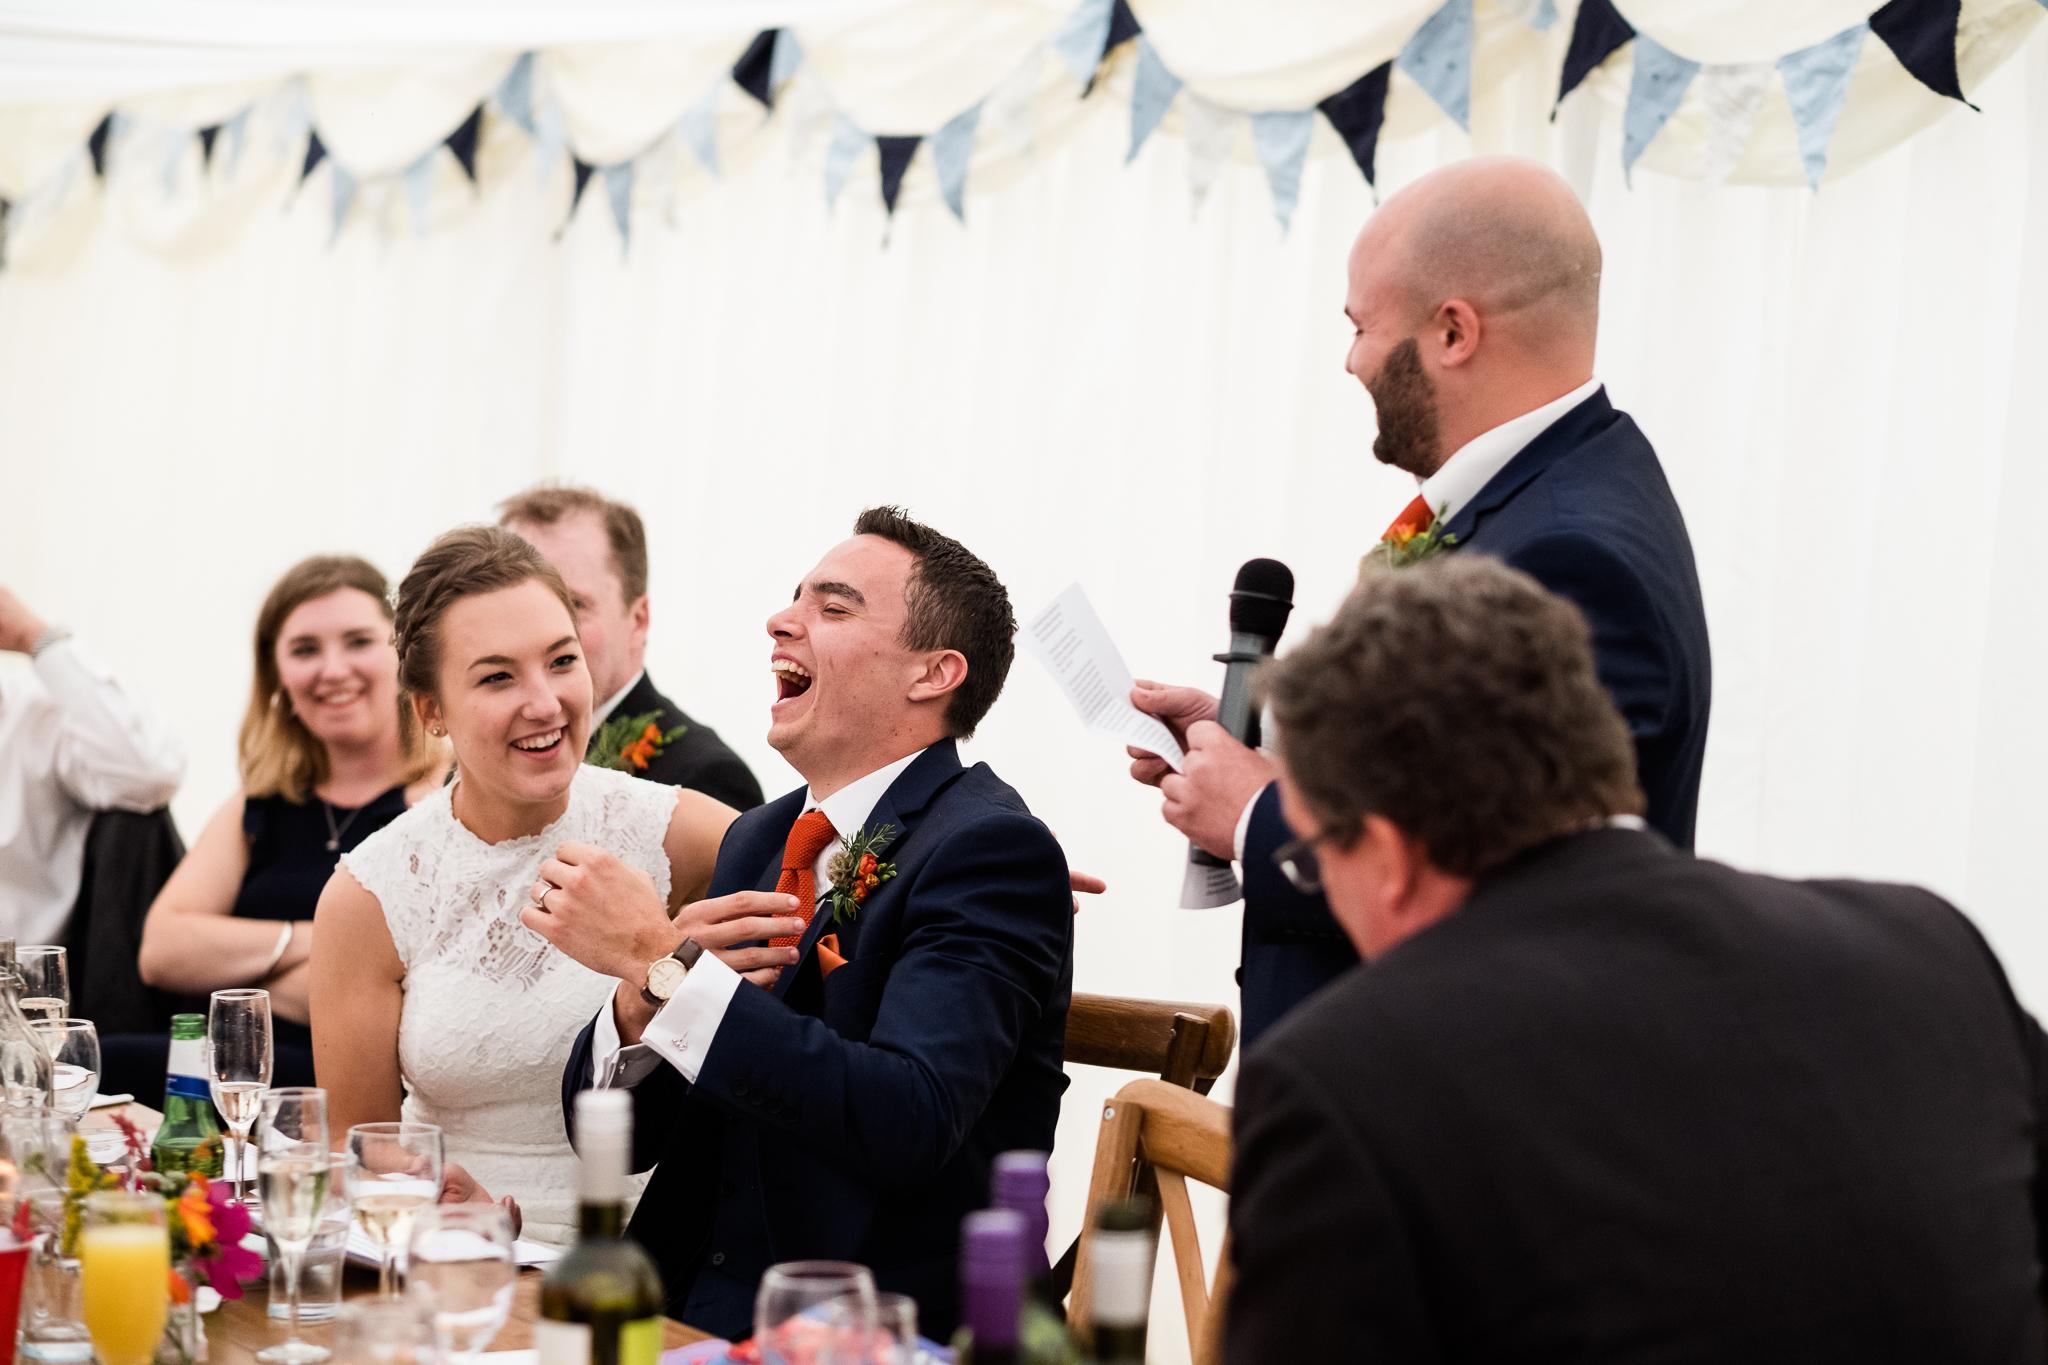 Relaxed Documentary Wedding Photography at The Wizard Inn, Alderley Edge Cheshire - Jenny Harper-75.jpg